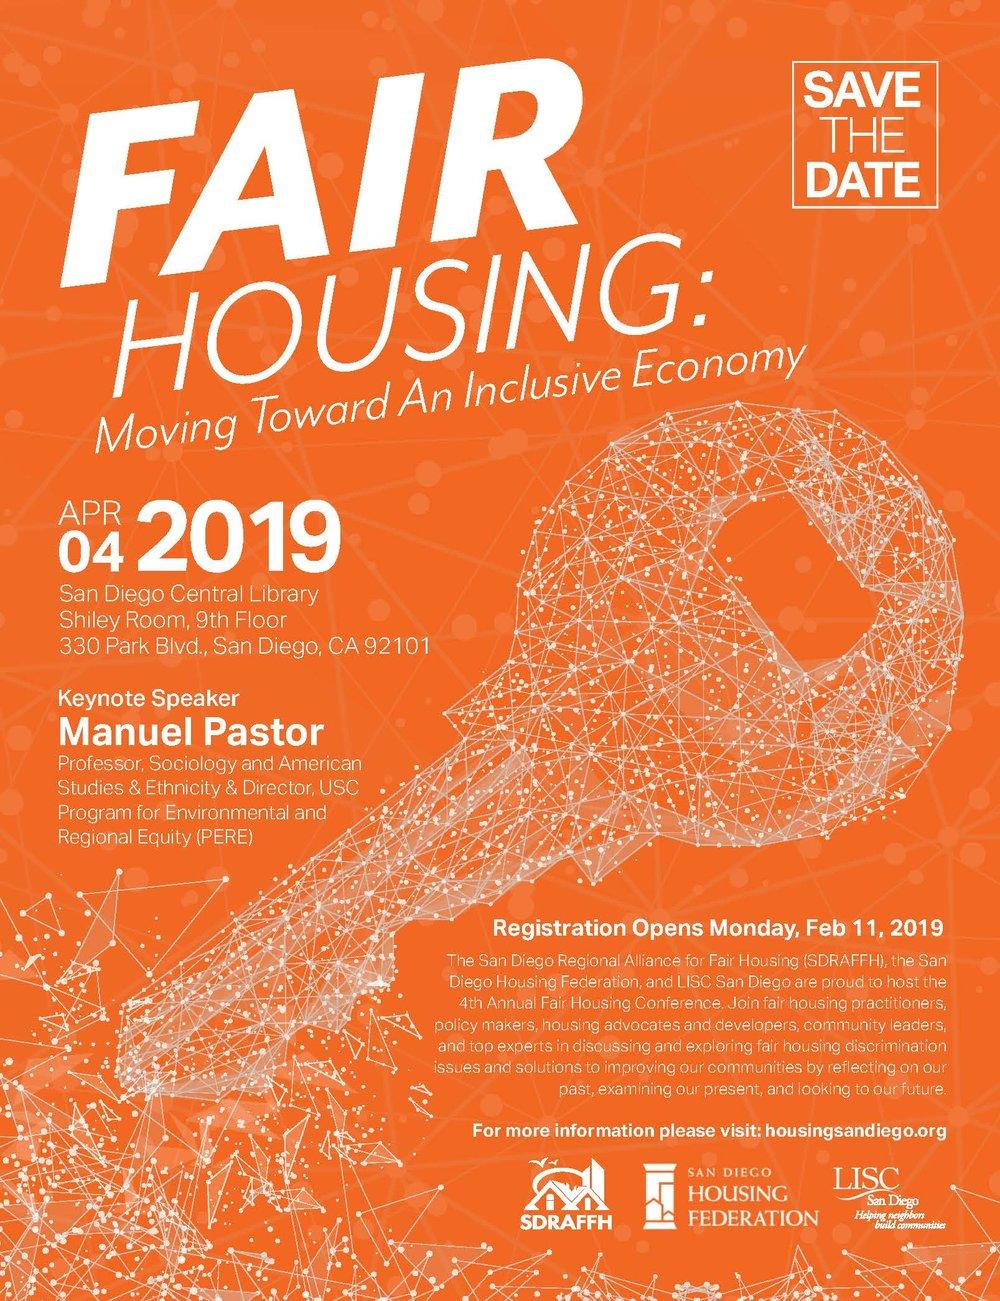 Fair_Housing_2019_SaveTheDate_Final_image.jpg